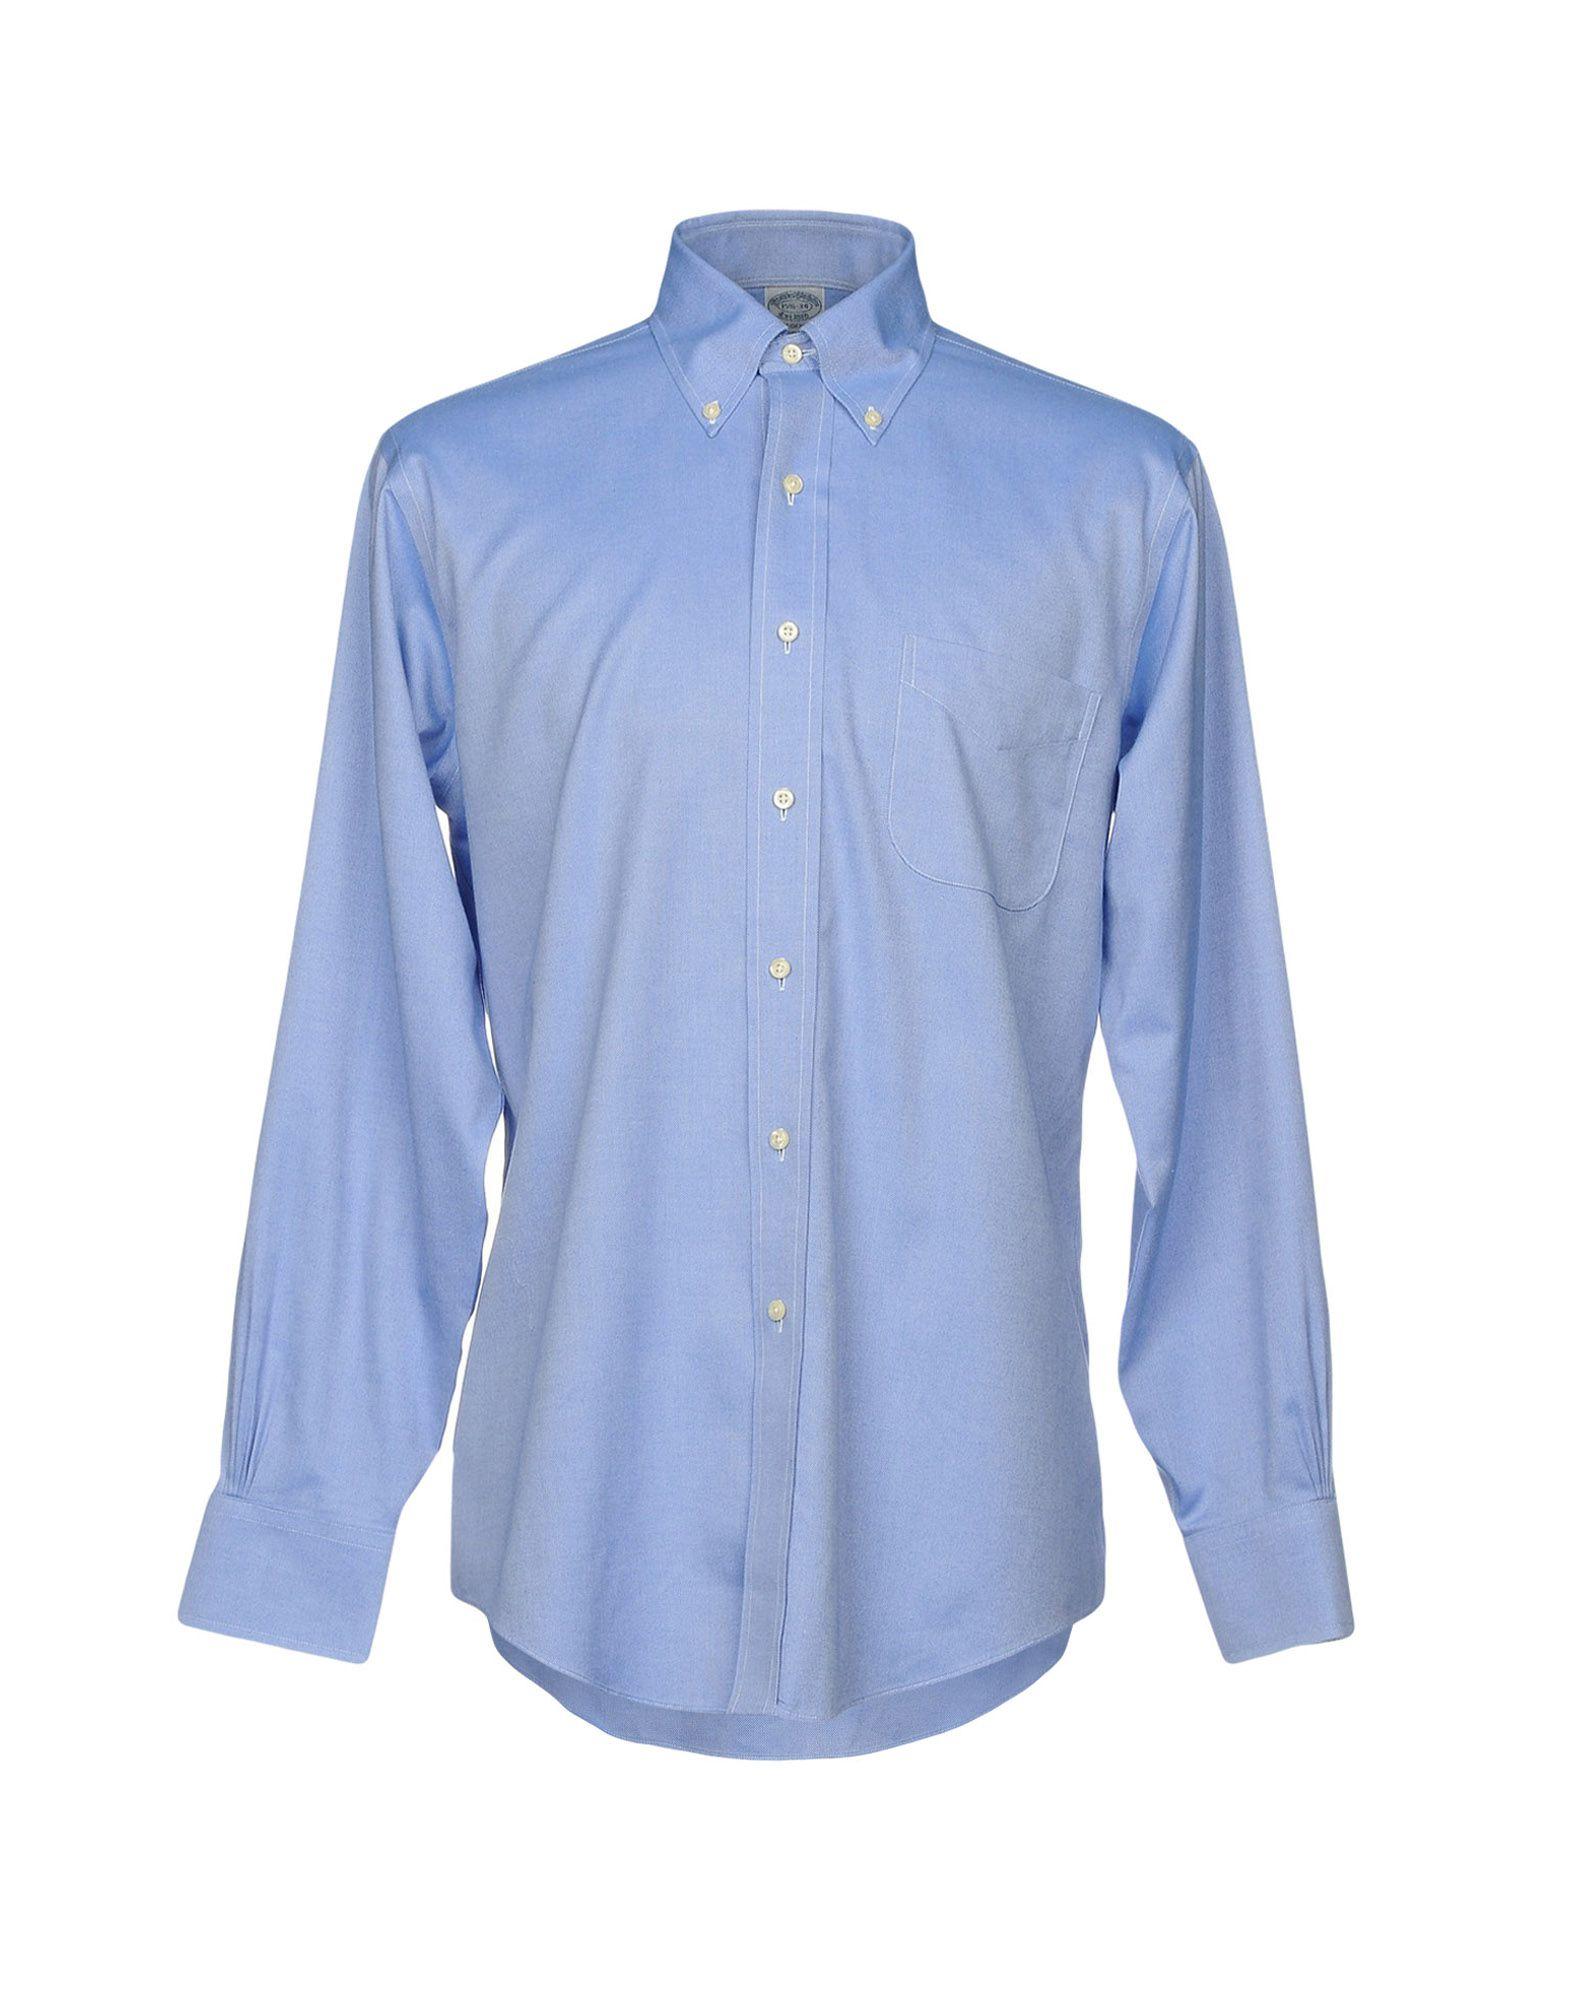 Camicia Tinta Unita Unita Tinta Brooks Brothers Uomo - 38720335OX a21c10